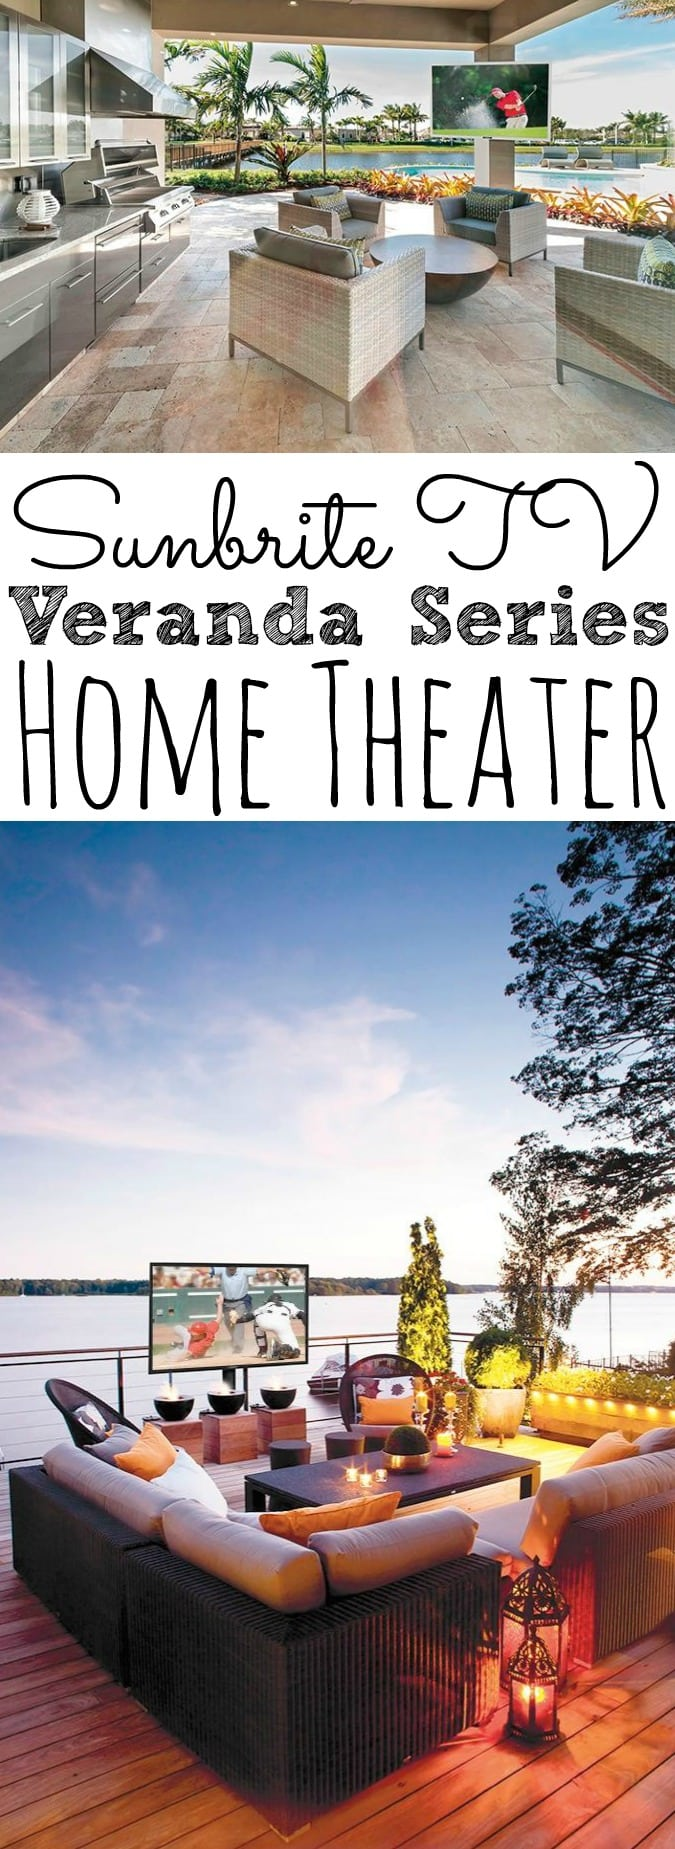 Sunbrite TV Veranda Series Home Theater - simplytodaylife.com